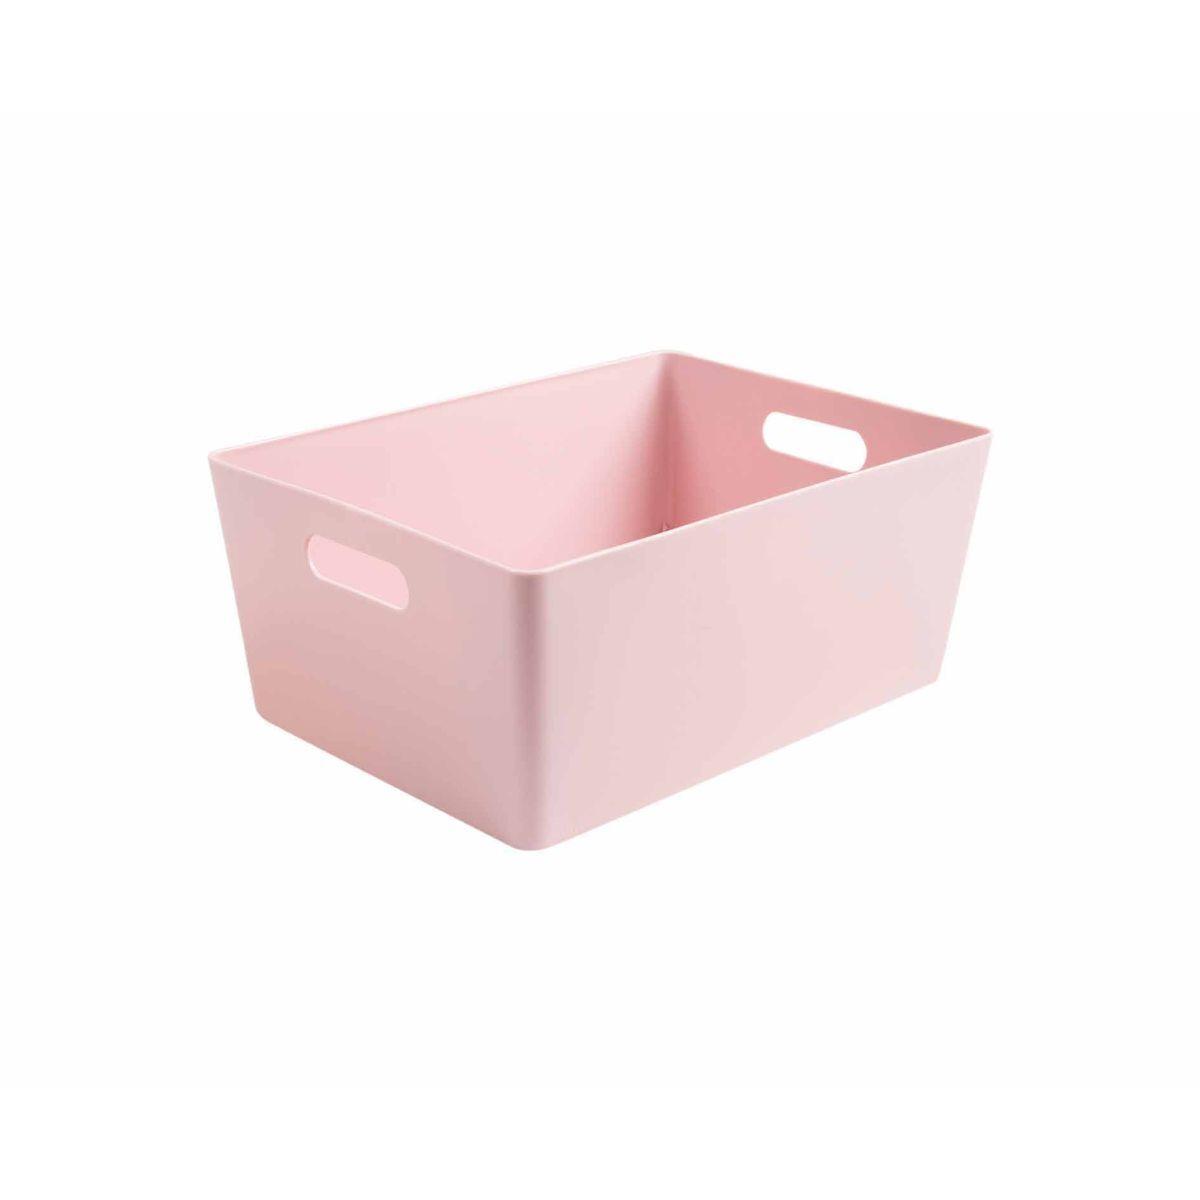 Wham Studio Basket 5.02 Pack of 12 Pink